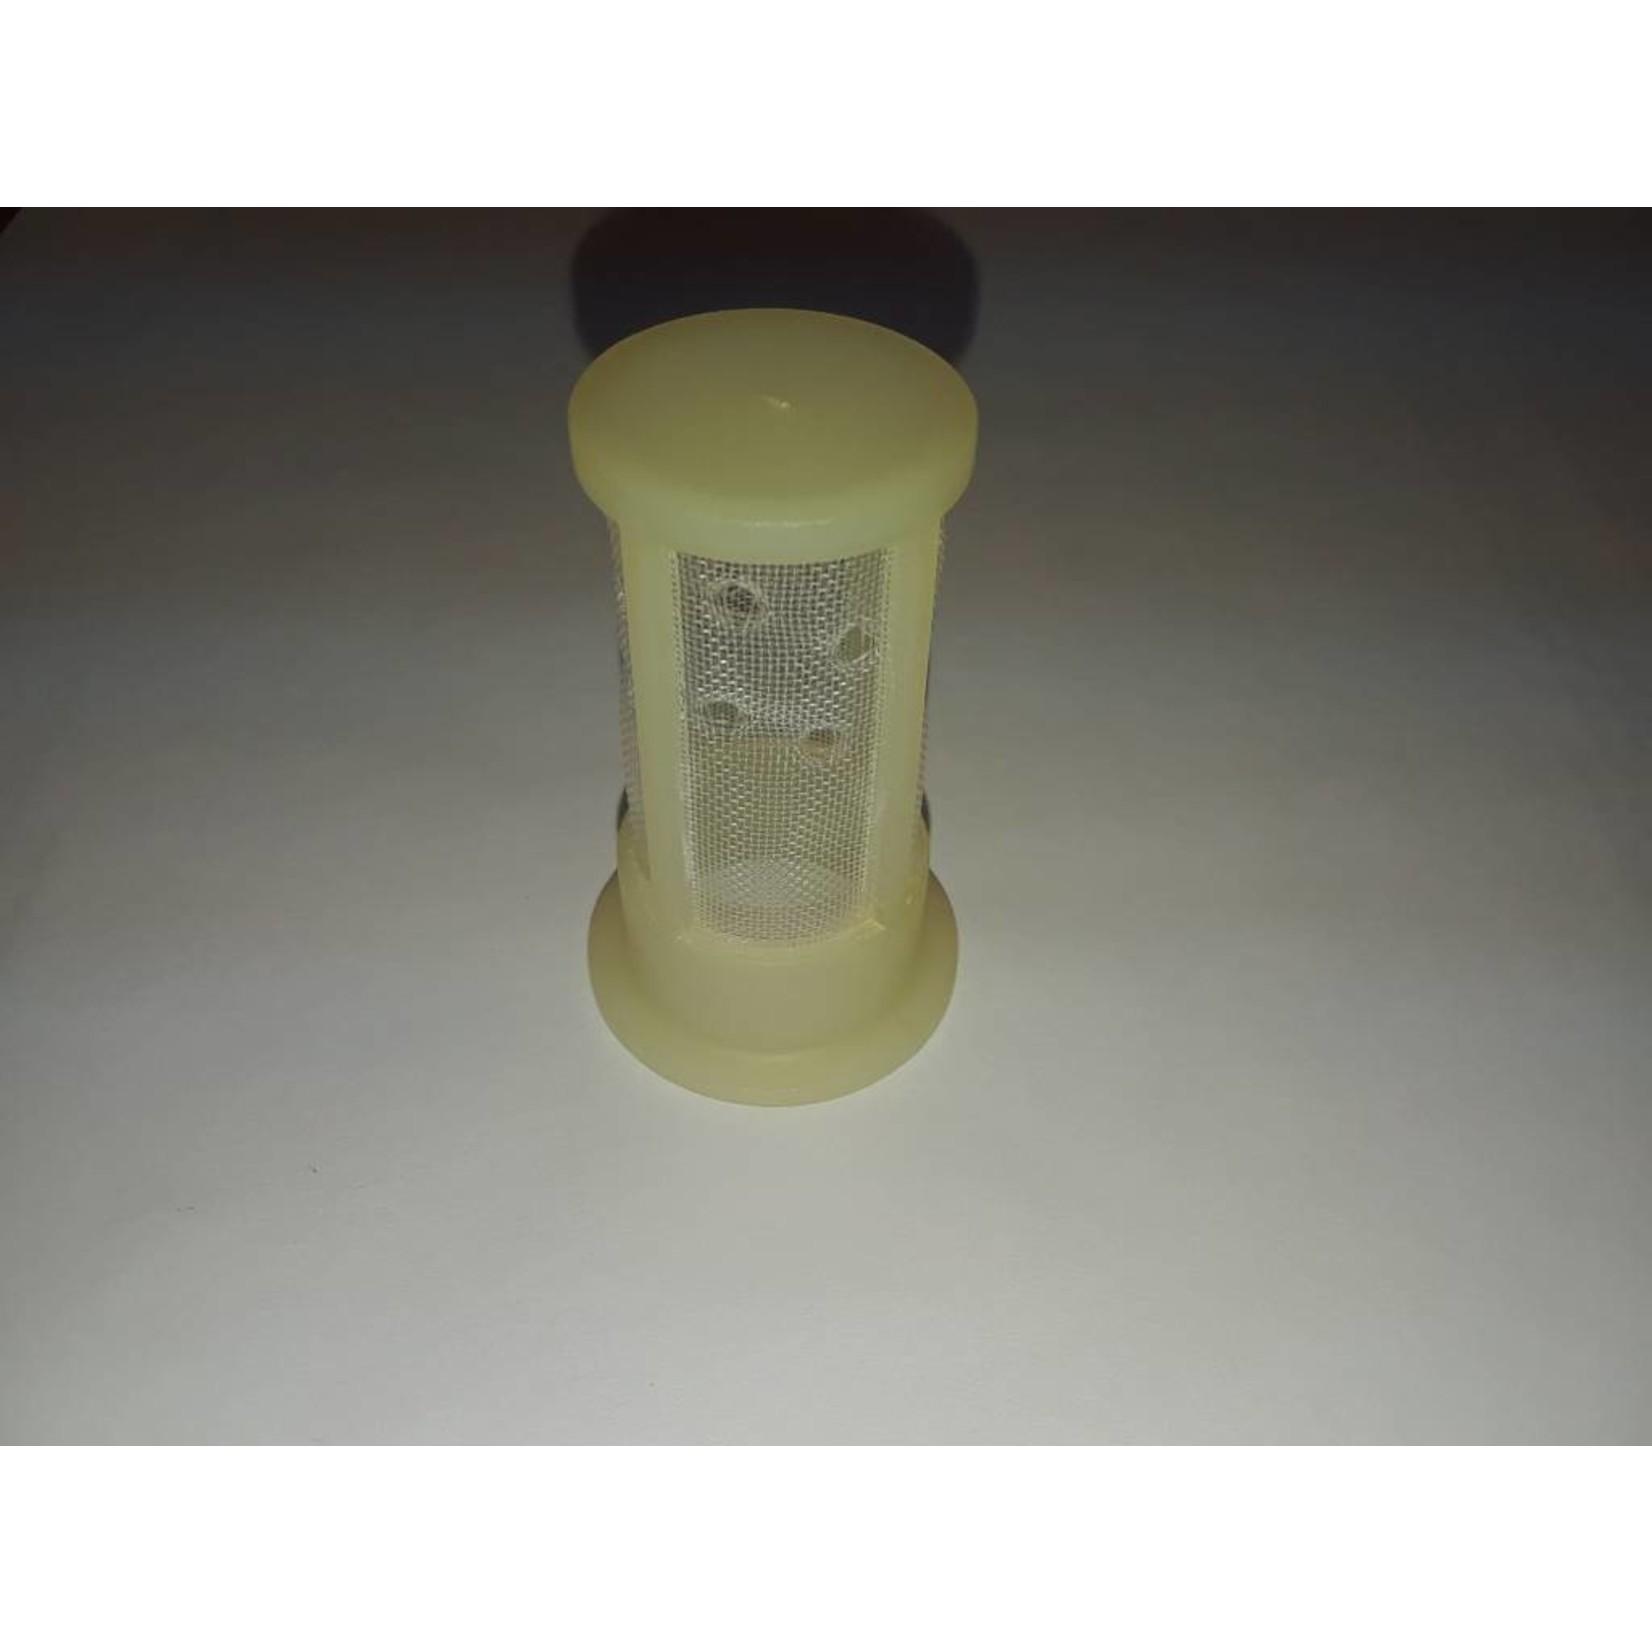 Advanced Vapor Advanced Vapor Ladybug Water Tank Filter